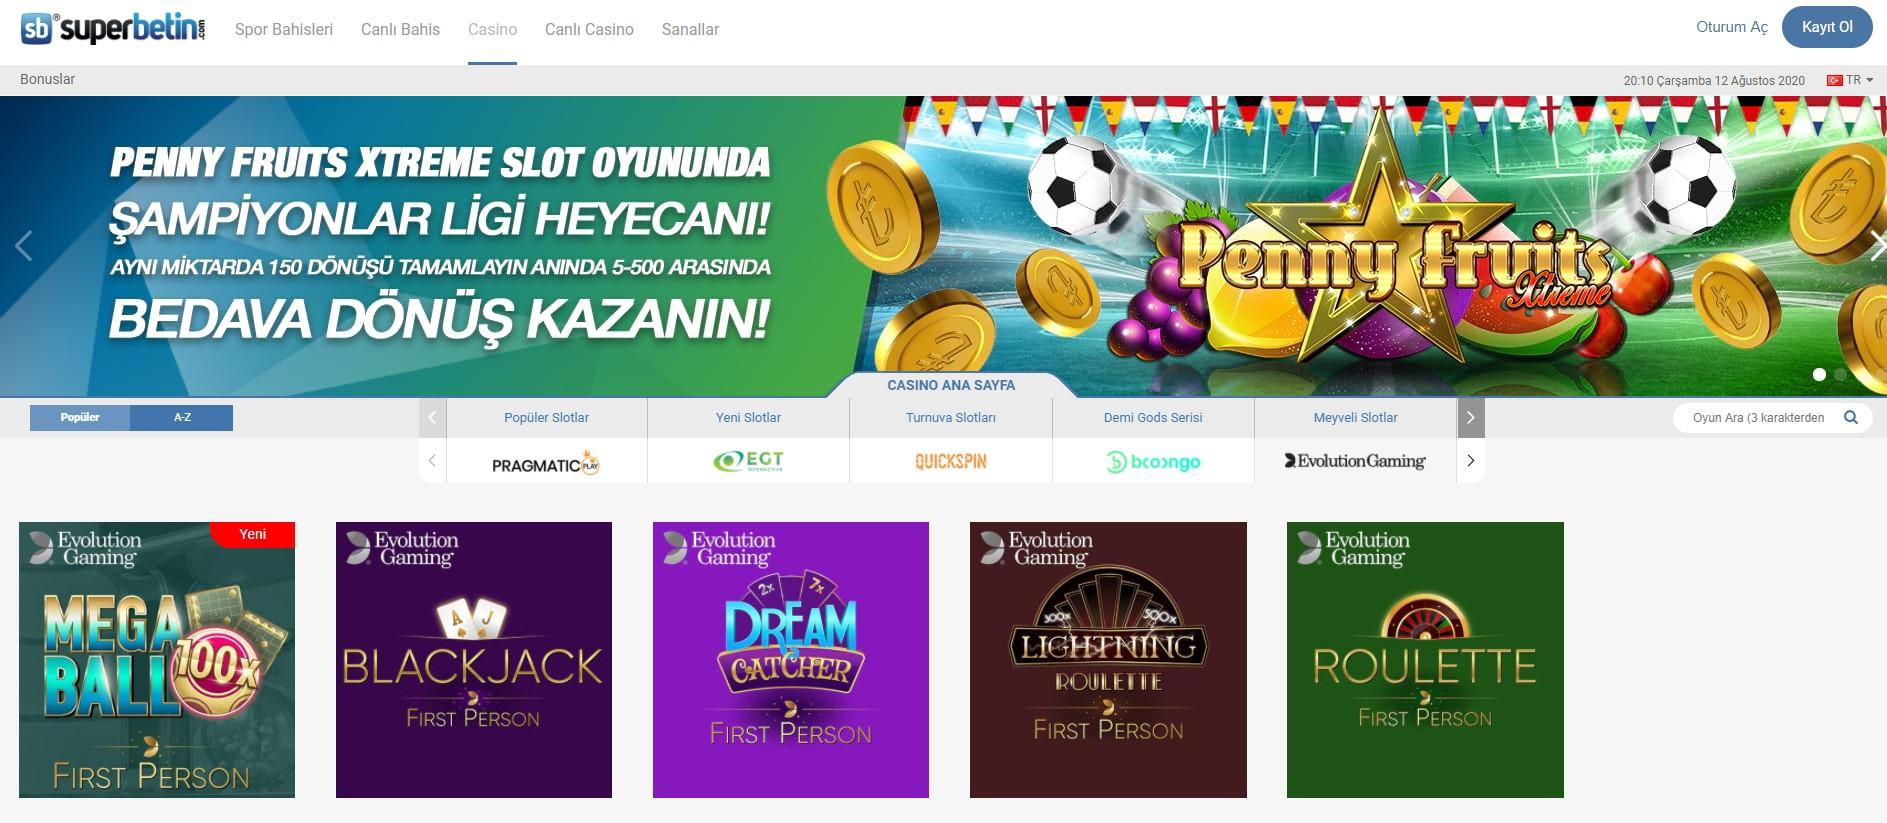 Süperbetin Casino Yeni Adresi